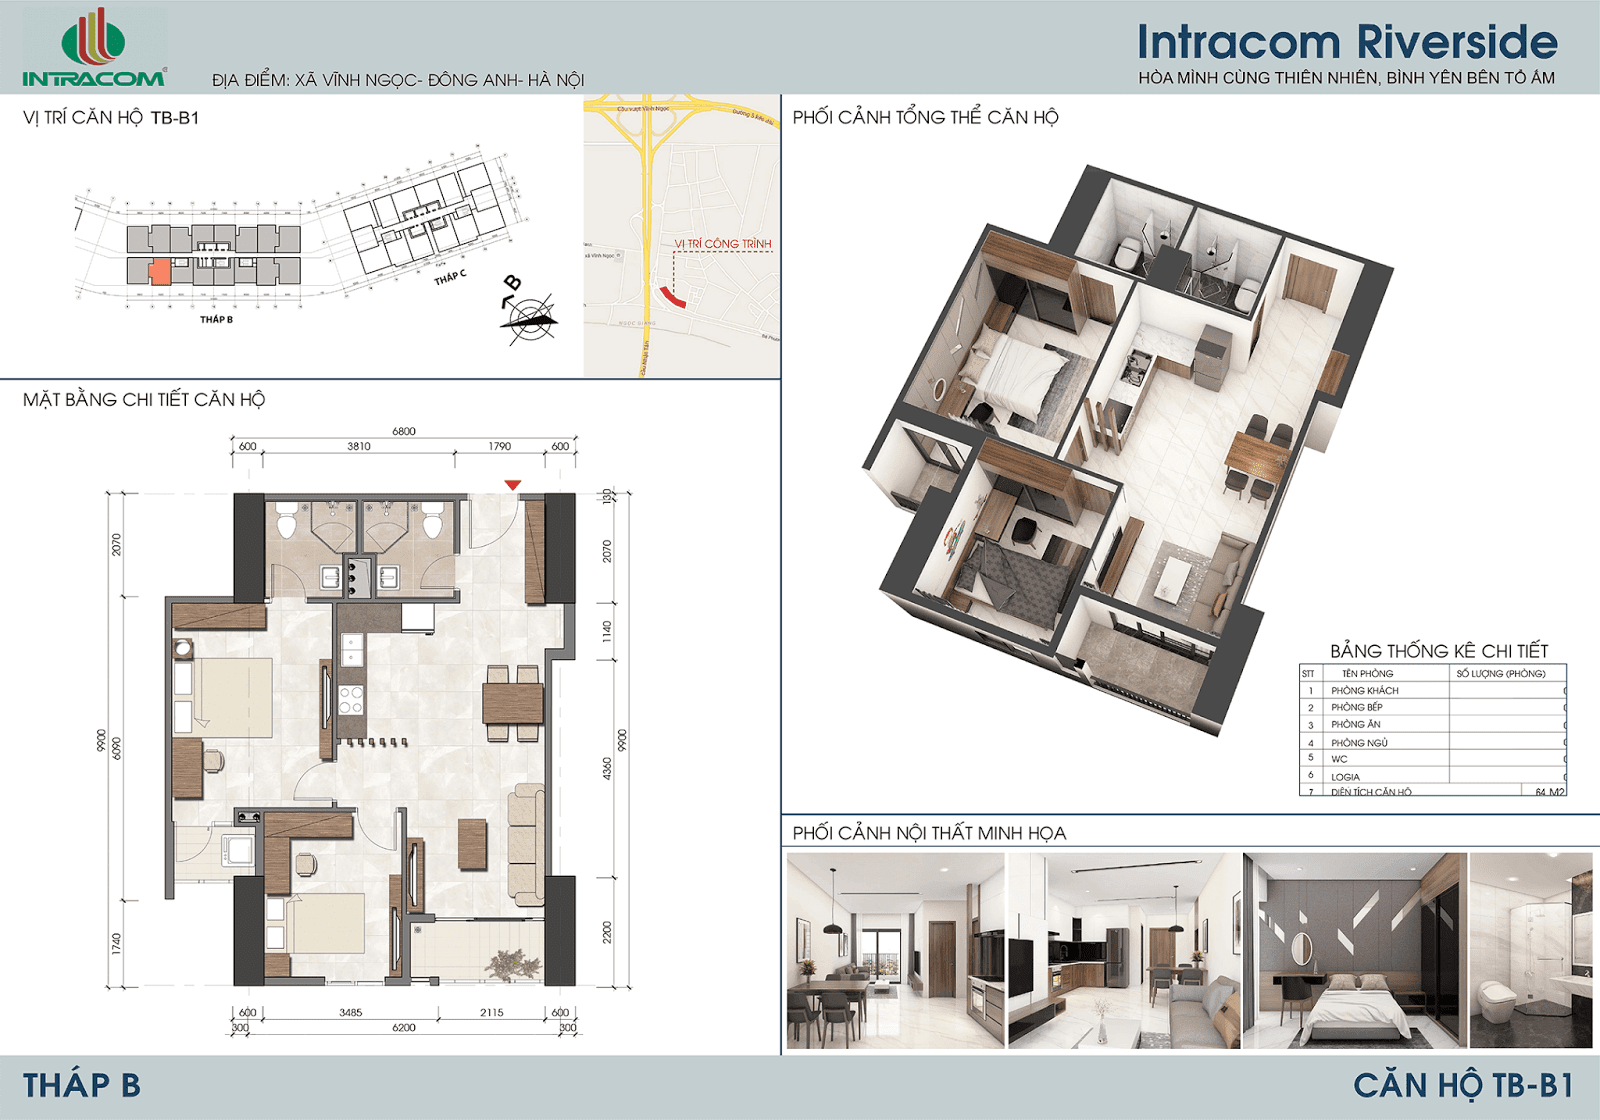 Thiết kế căn 10 - 15 - 64m2